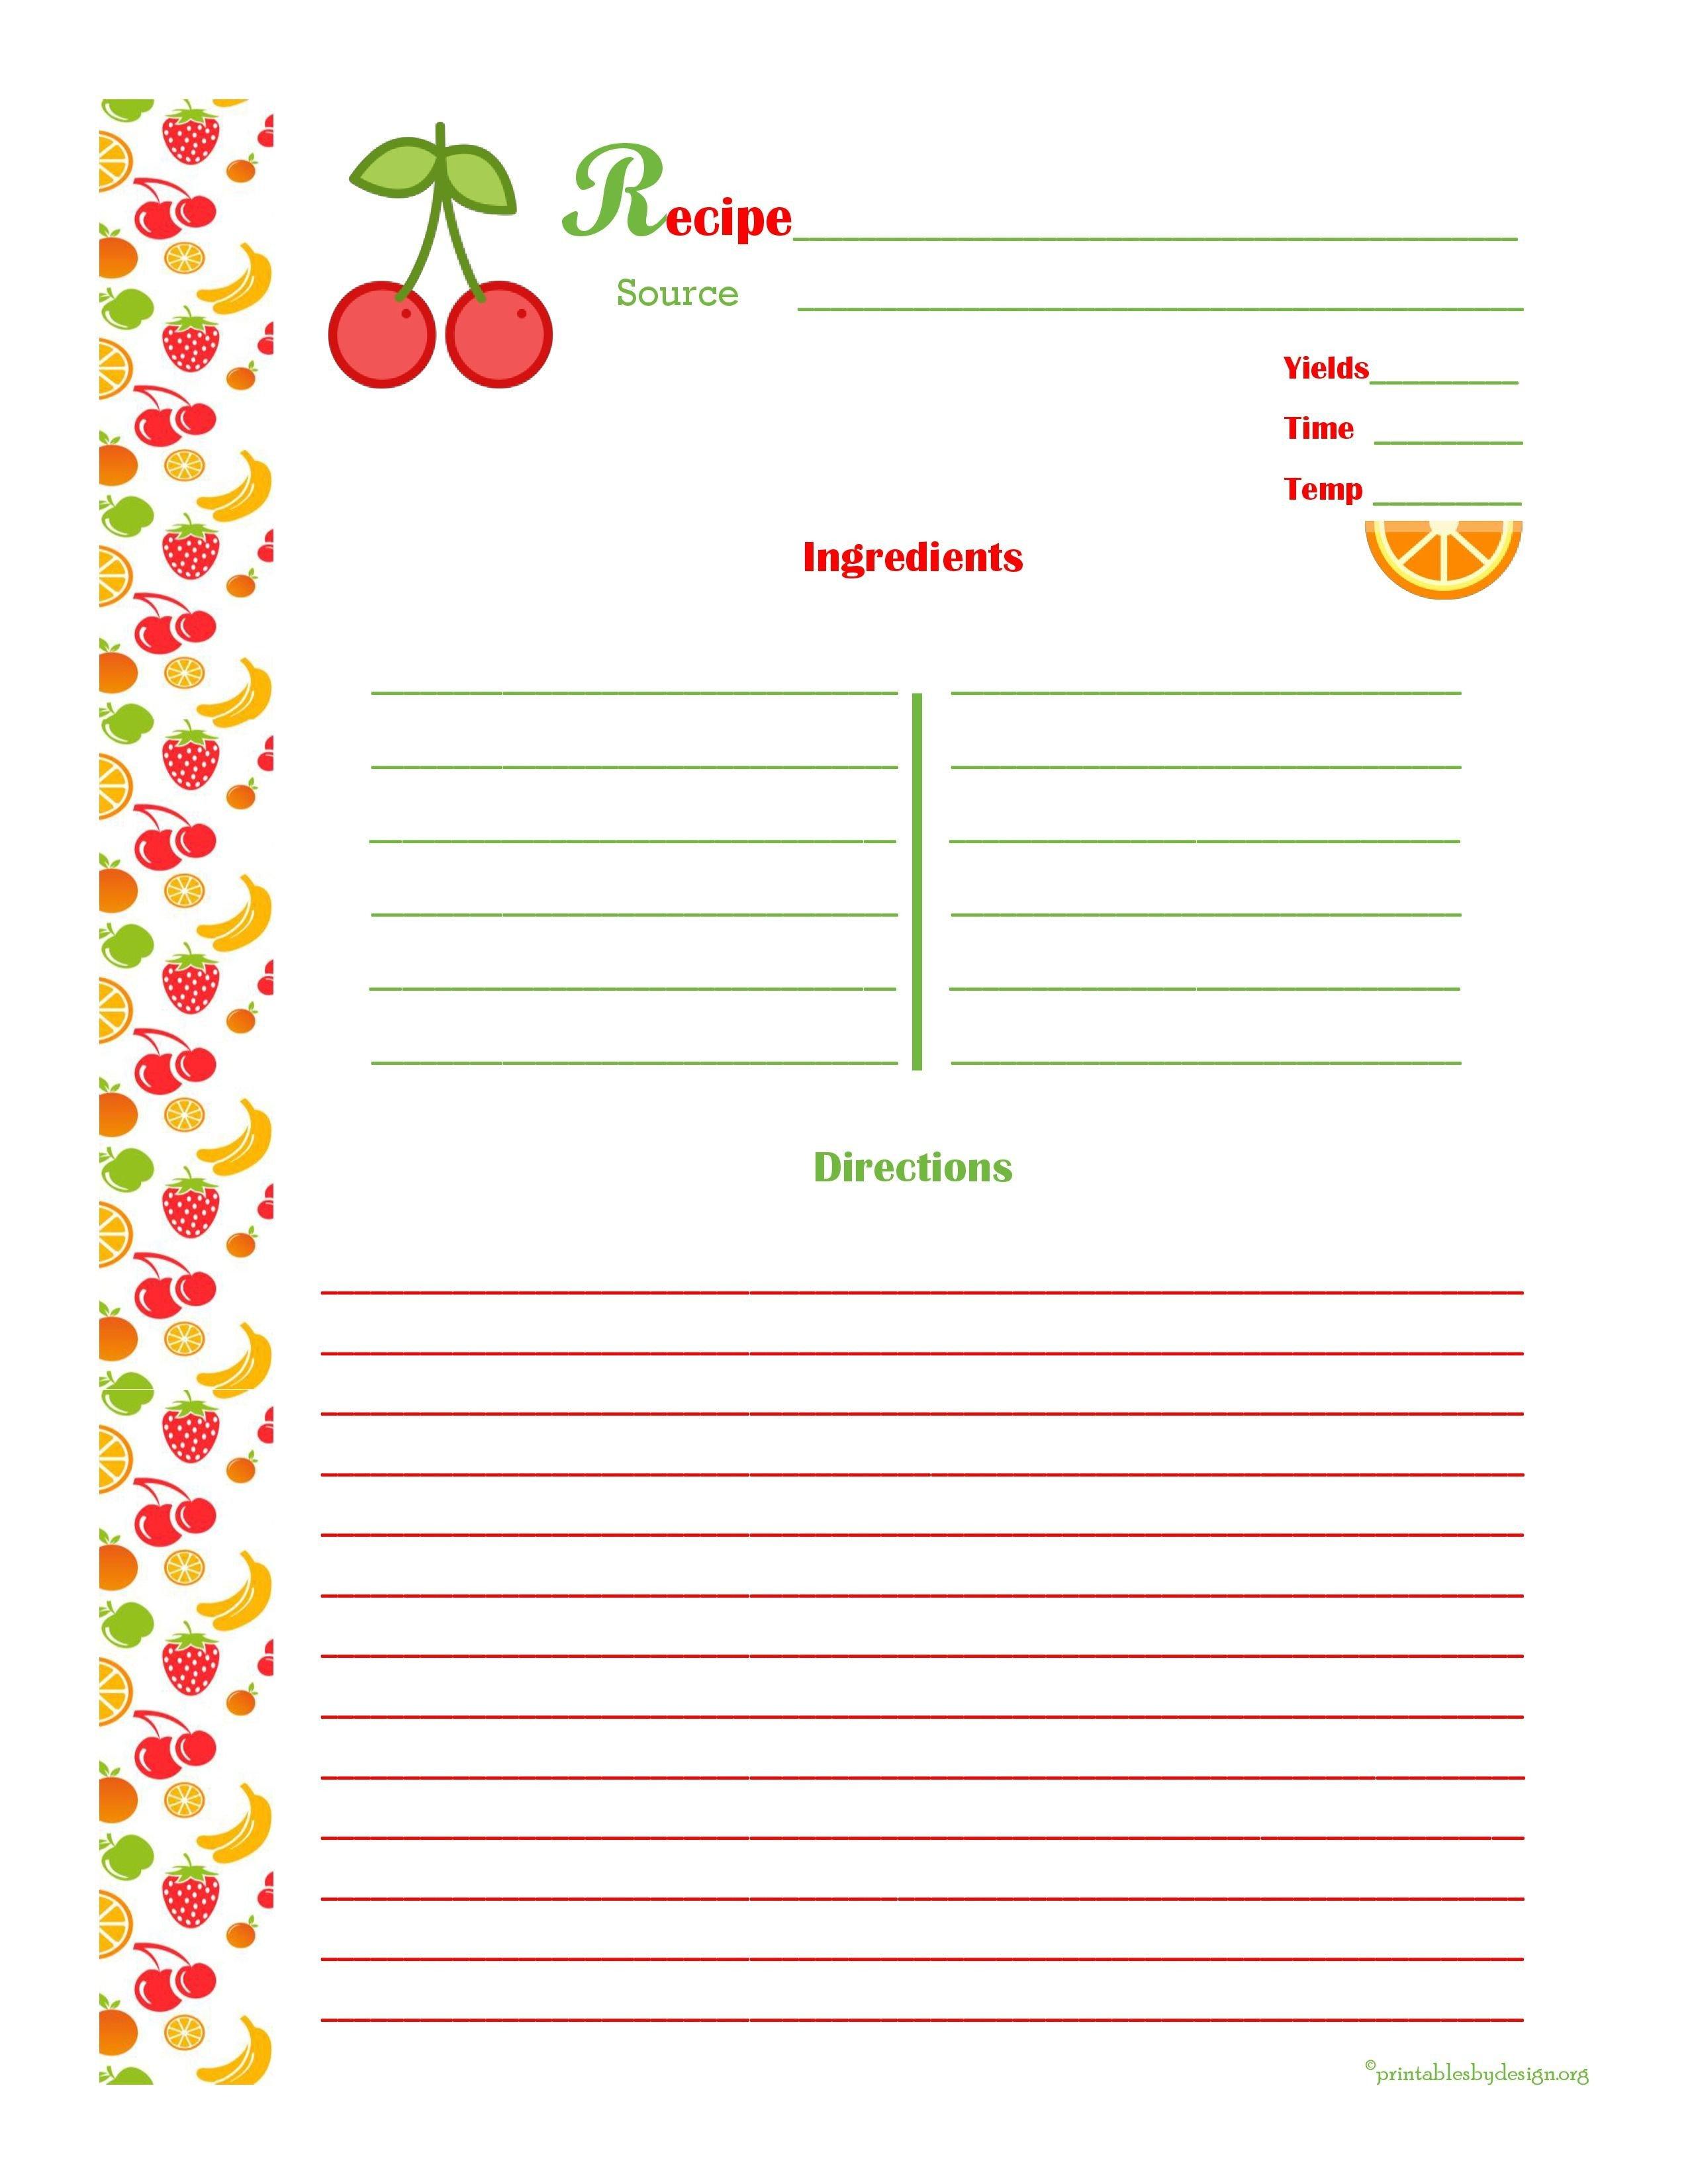 Free Recipe Book Template Cherry & orange Recipe Card Full Page